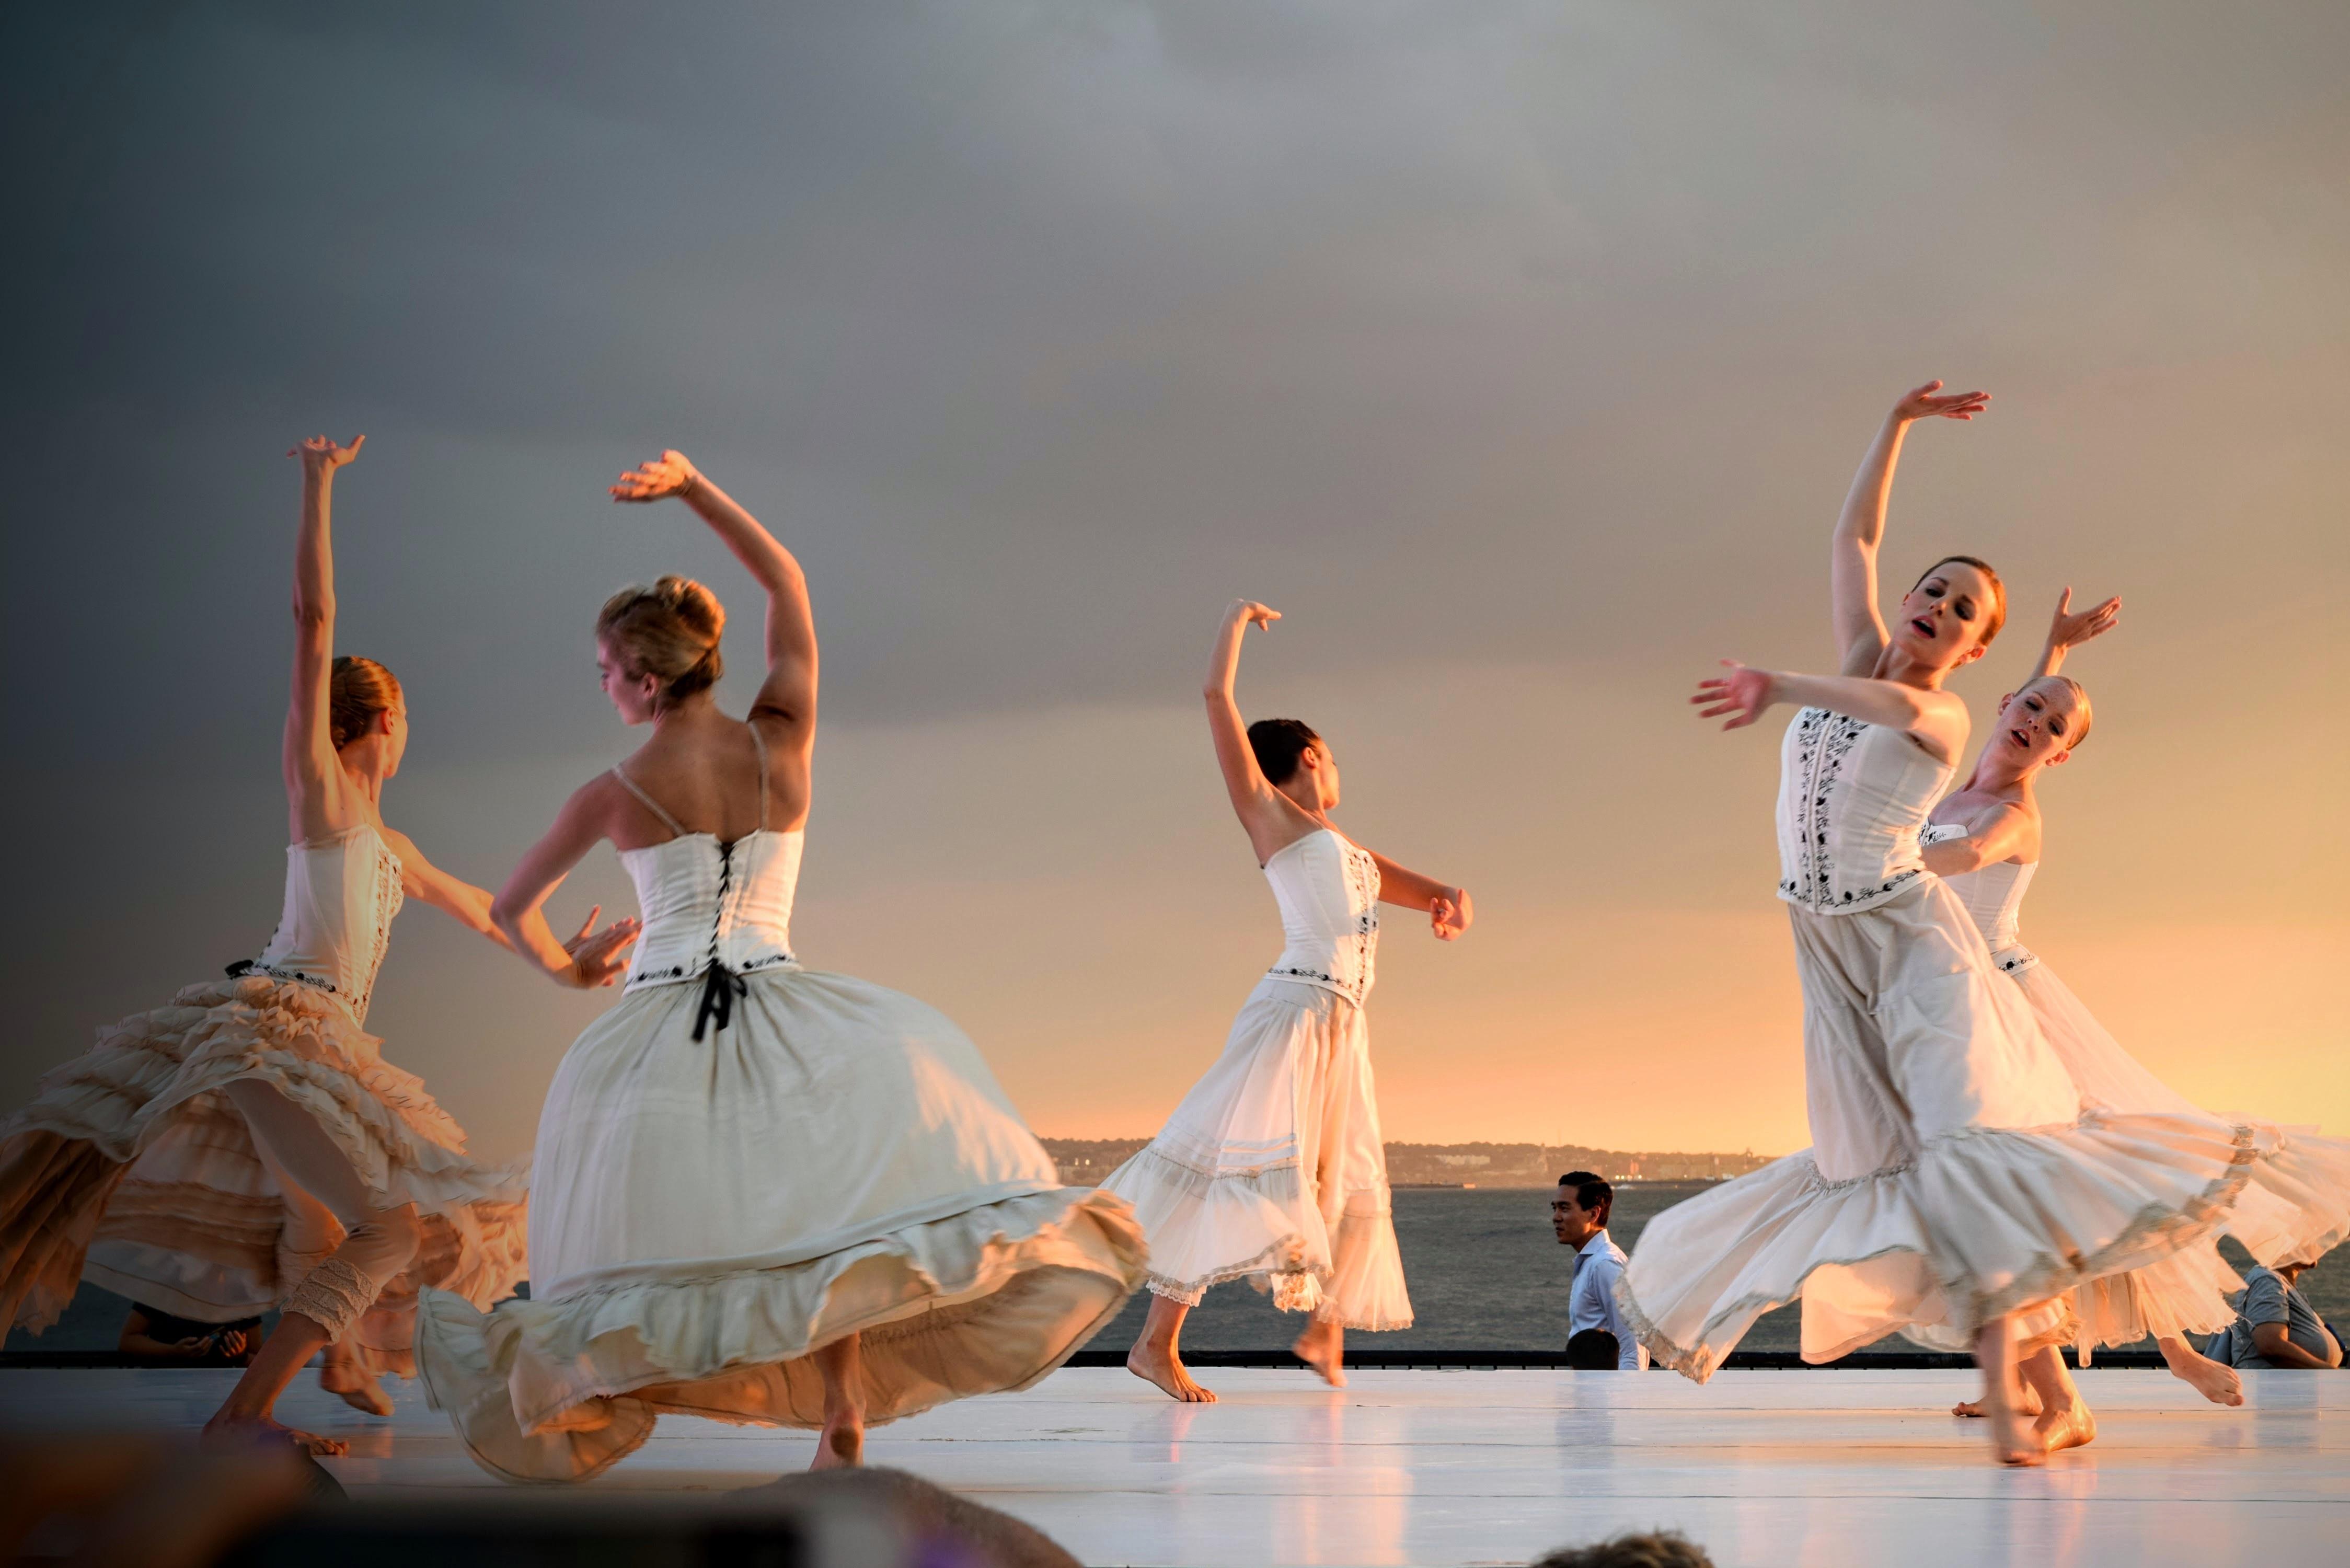 Menari balet performance art olahraga peristiwa hiburan seni drama koreografi tim olahraga teater musikal tari modern